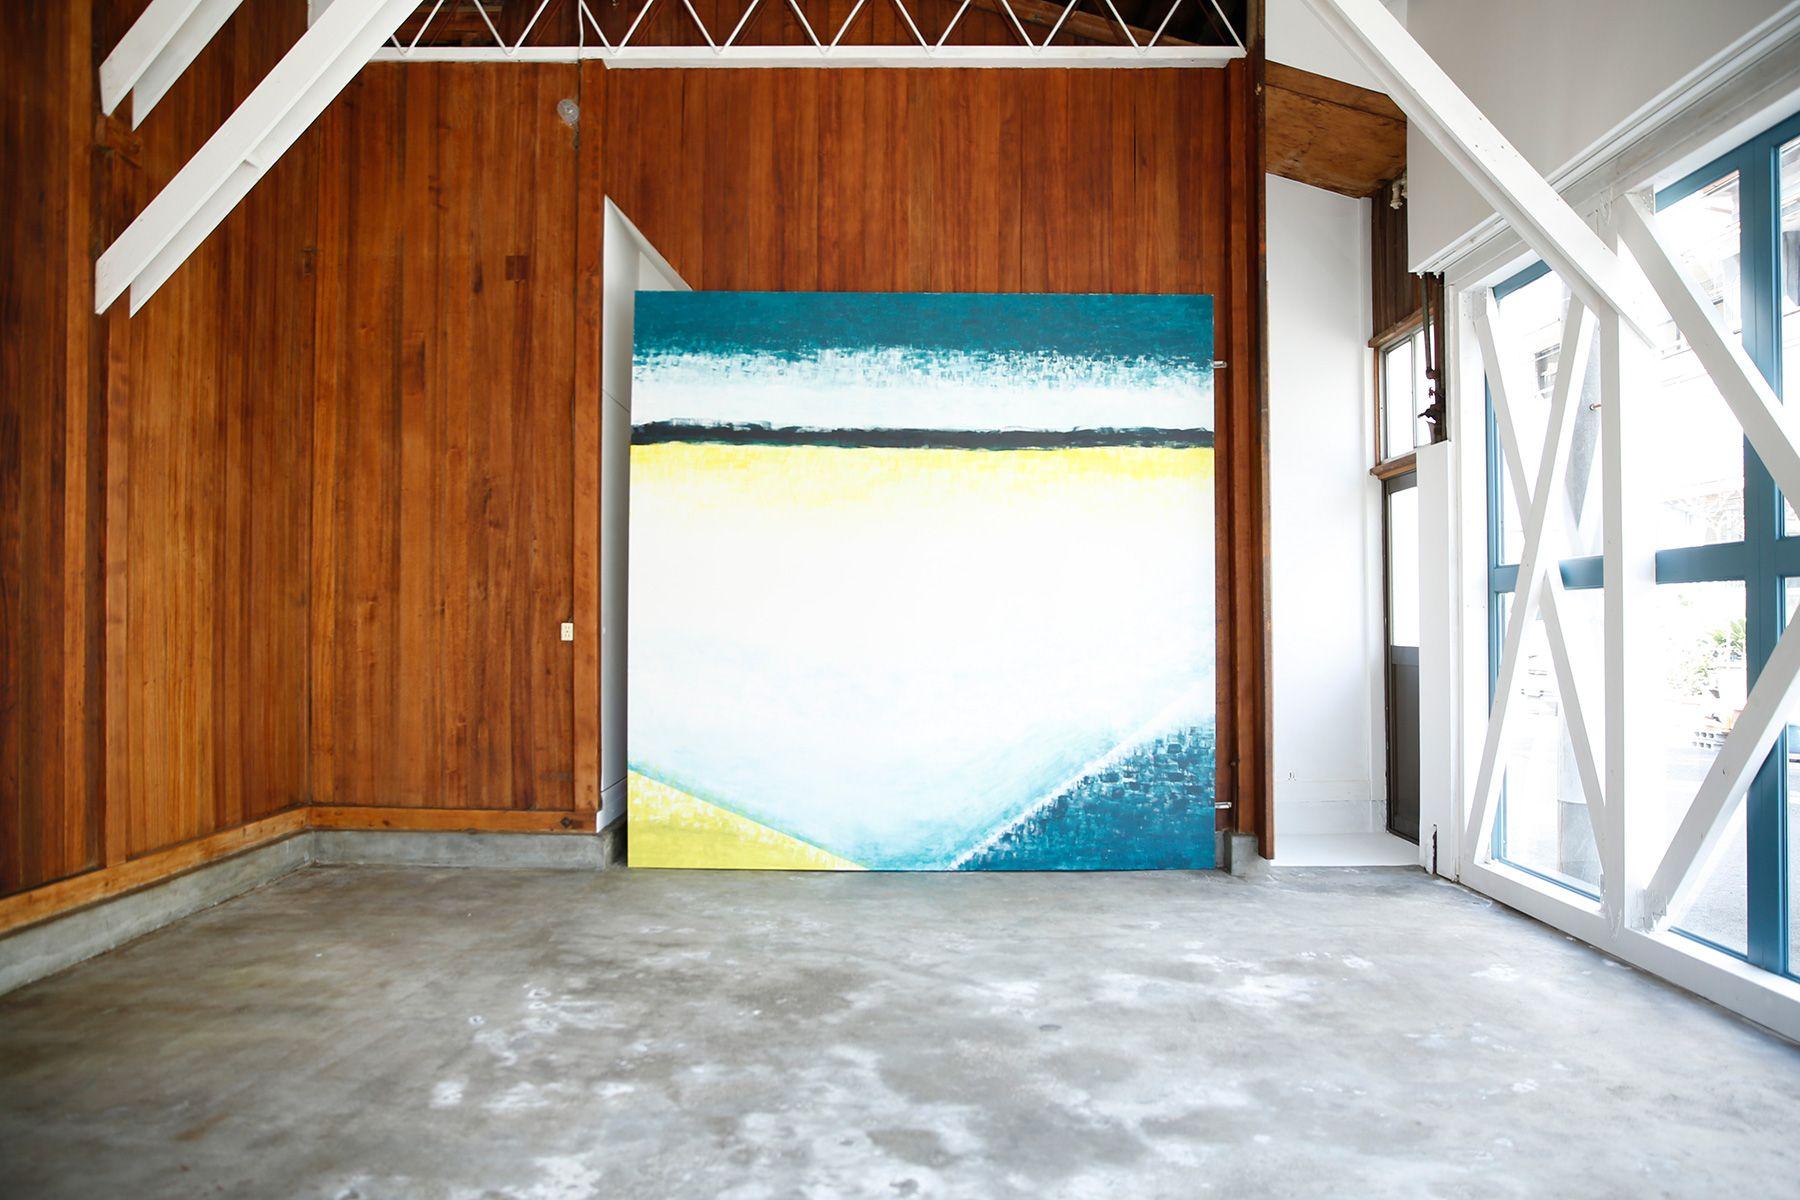 studio PEANUTS (スタジオ ピーナッツ)2F/切り替えグレー壁